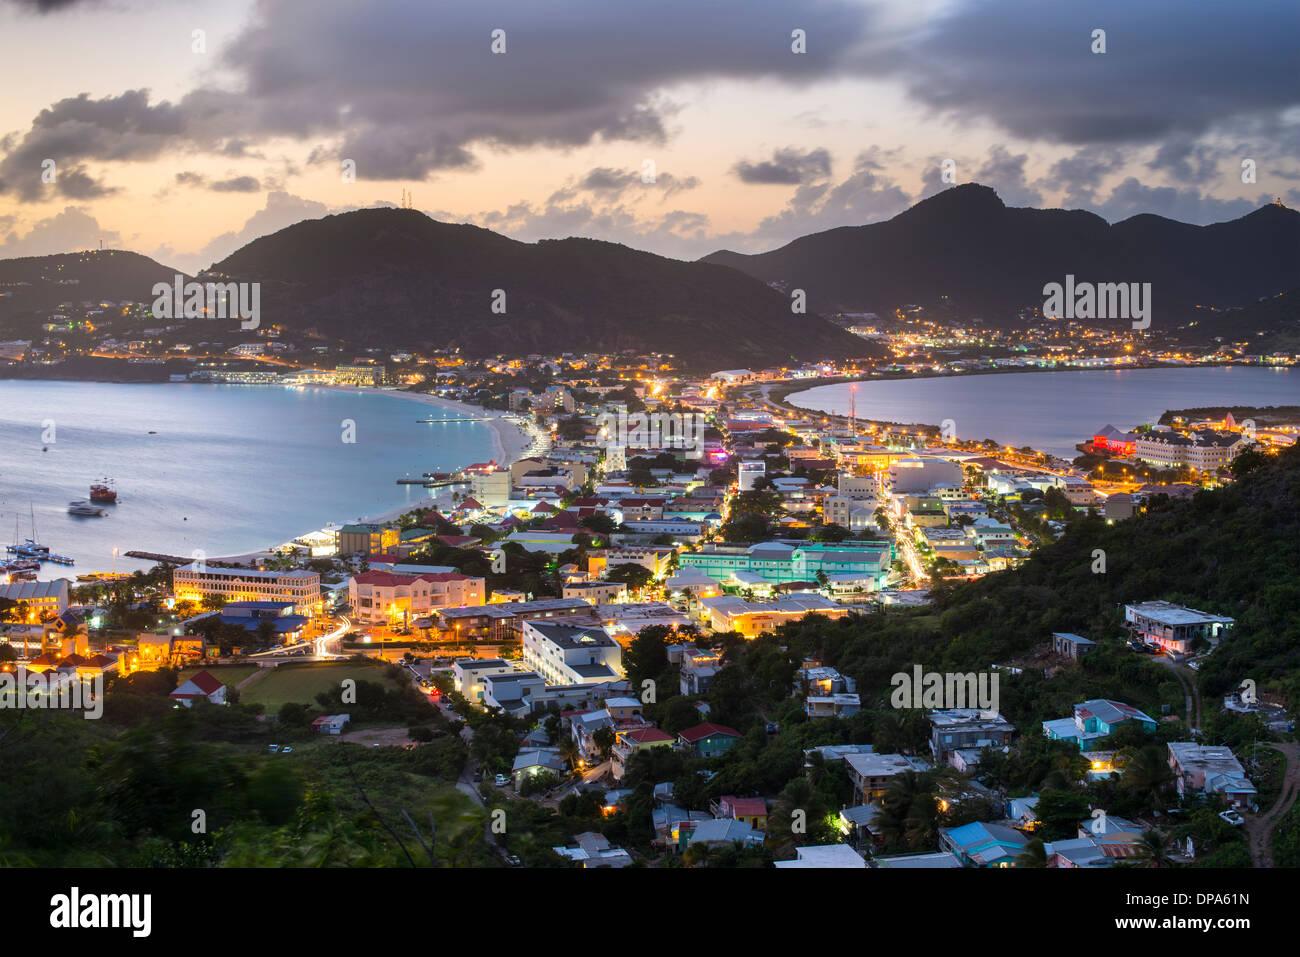 Philipsburg, Sint Maarten in der Karibik. Stockbild